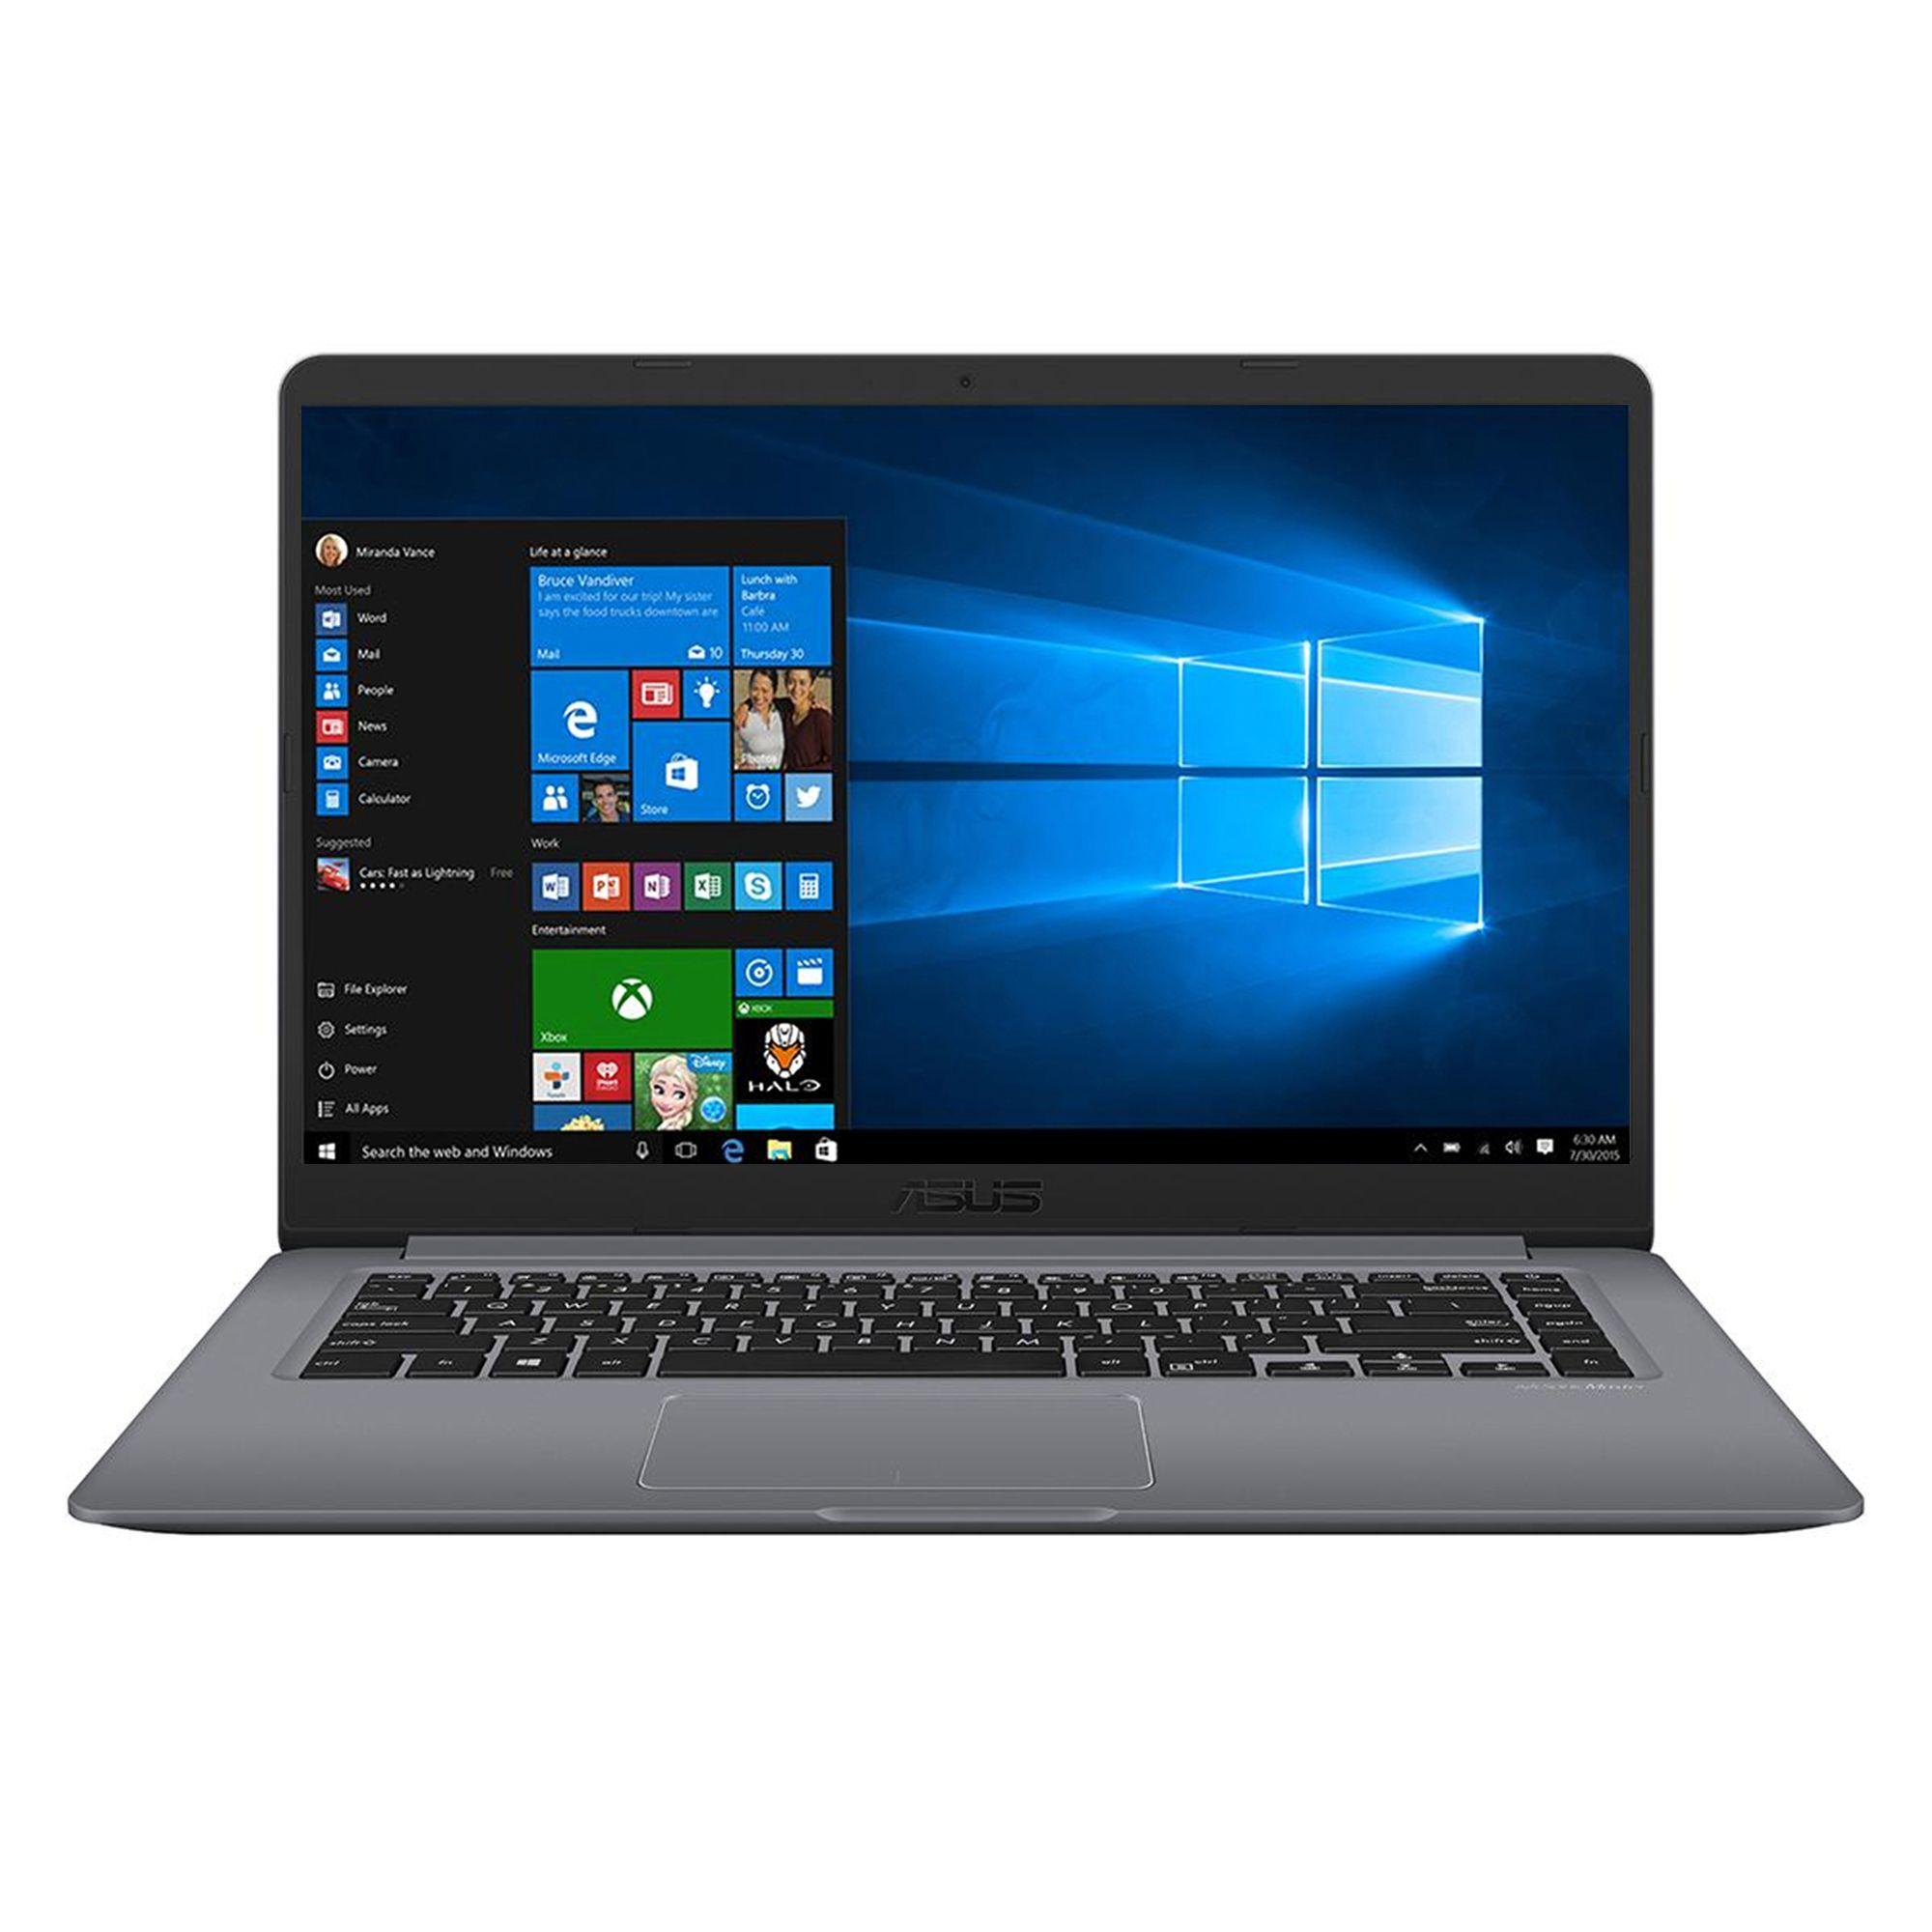 Notebook Asus VivoBook S15 S510UA 15.6 Full HD Intel Core i5-8250U RAM 4GB SSD 256GB Windows 10 Pro Gri